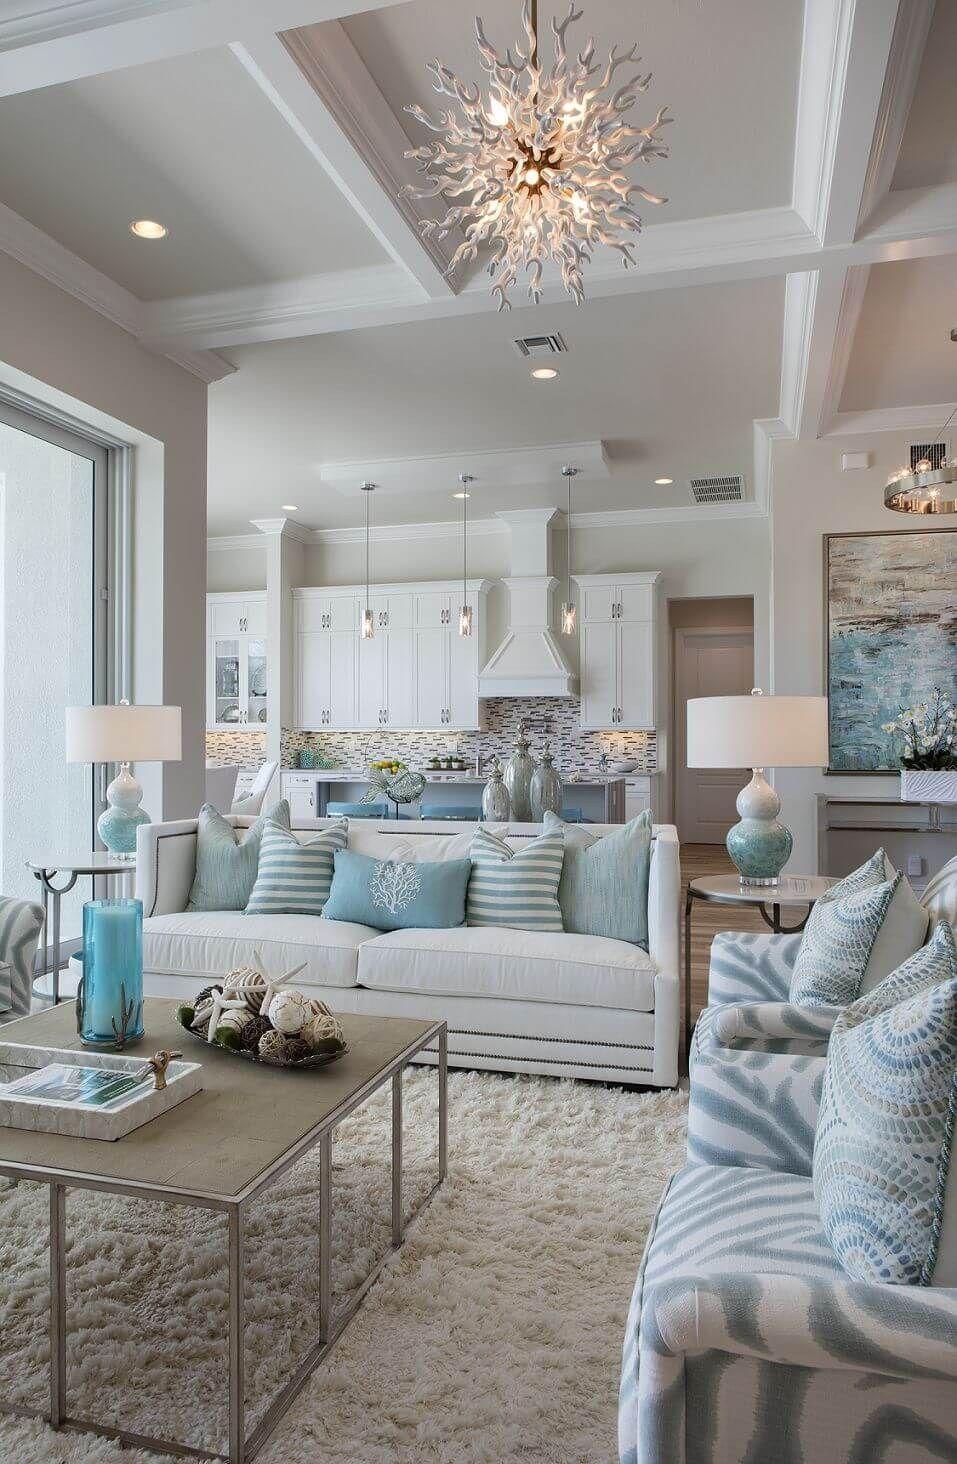 Beach Home Interior Design Ideas 32 Best Beach House Interior